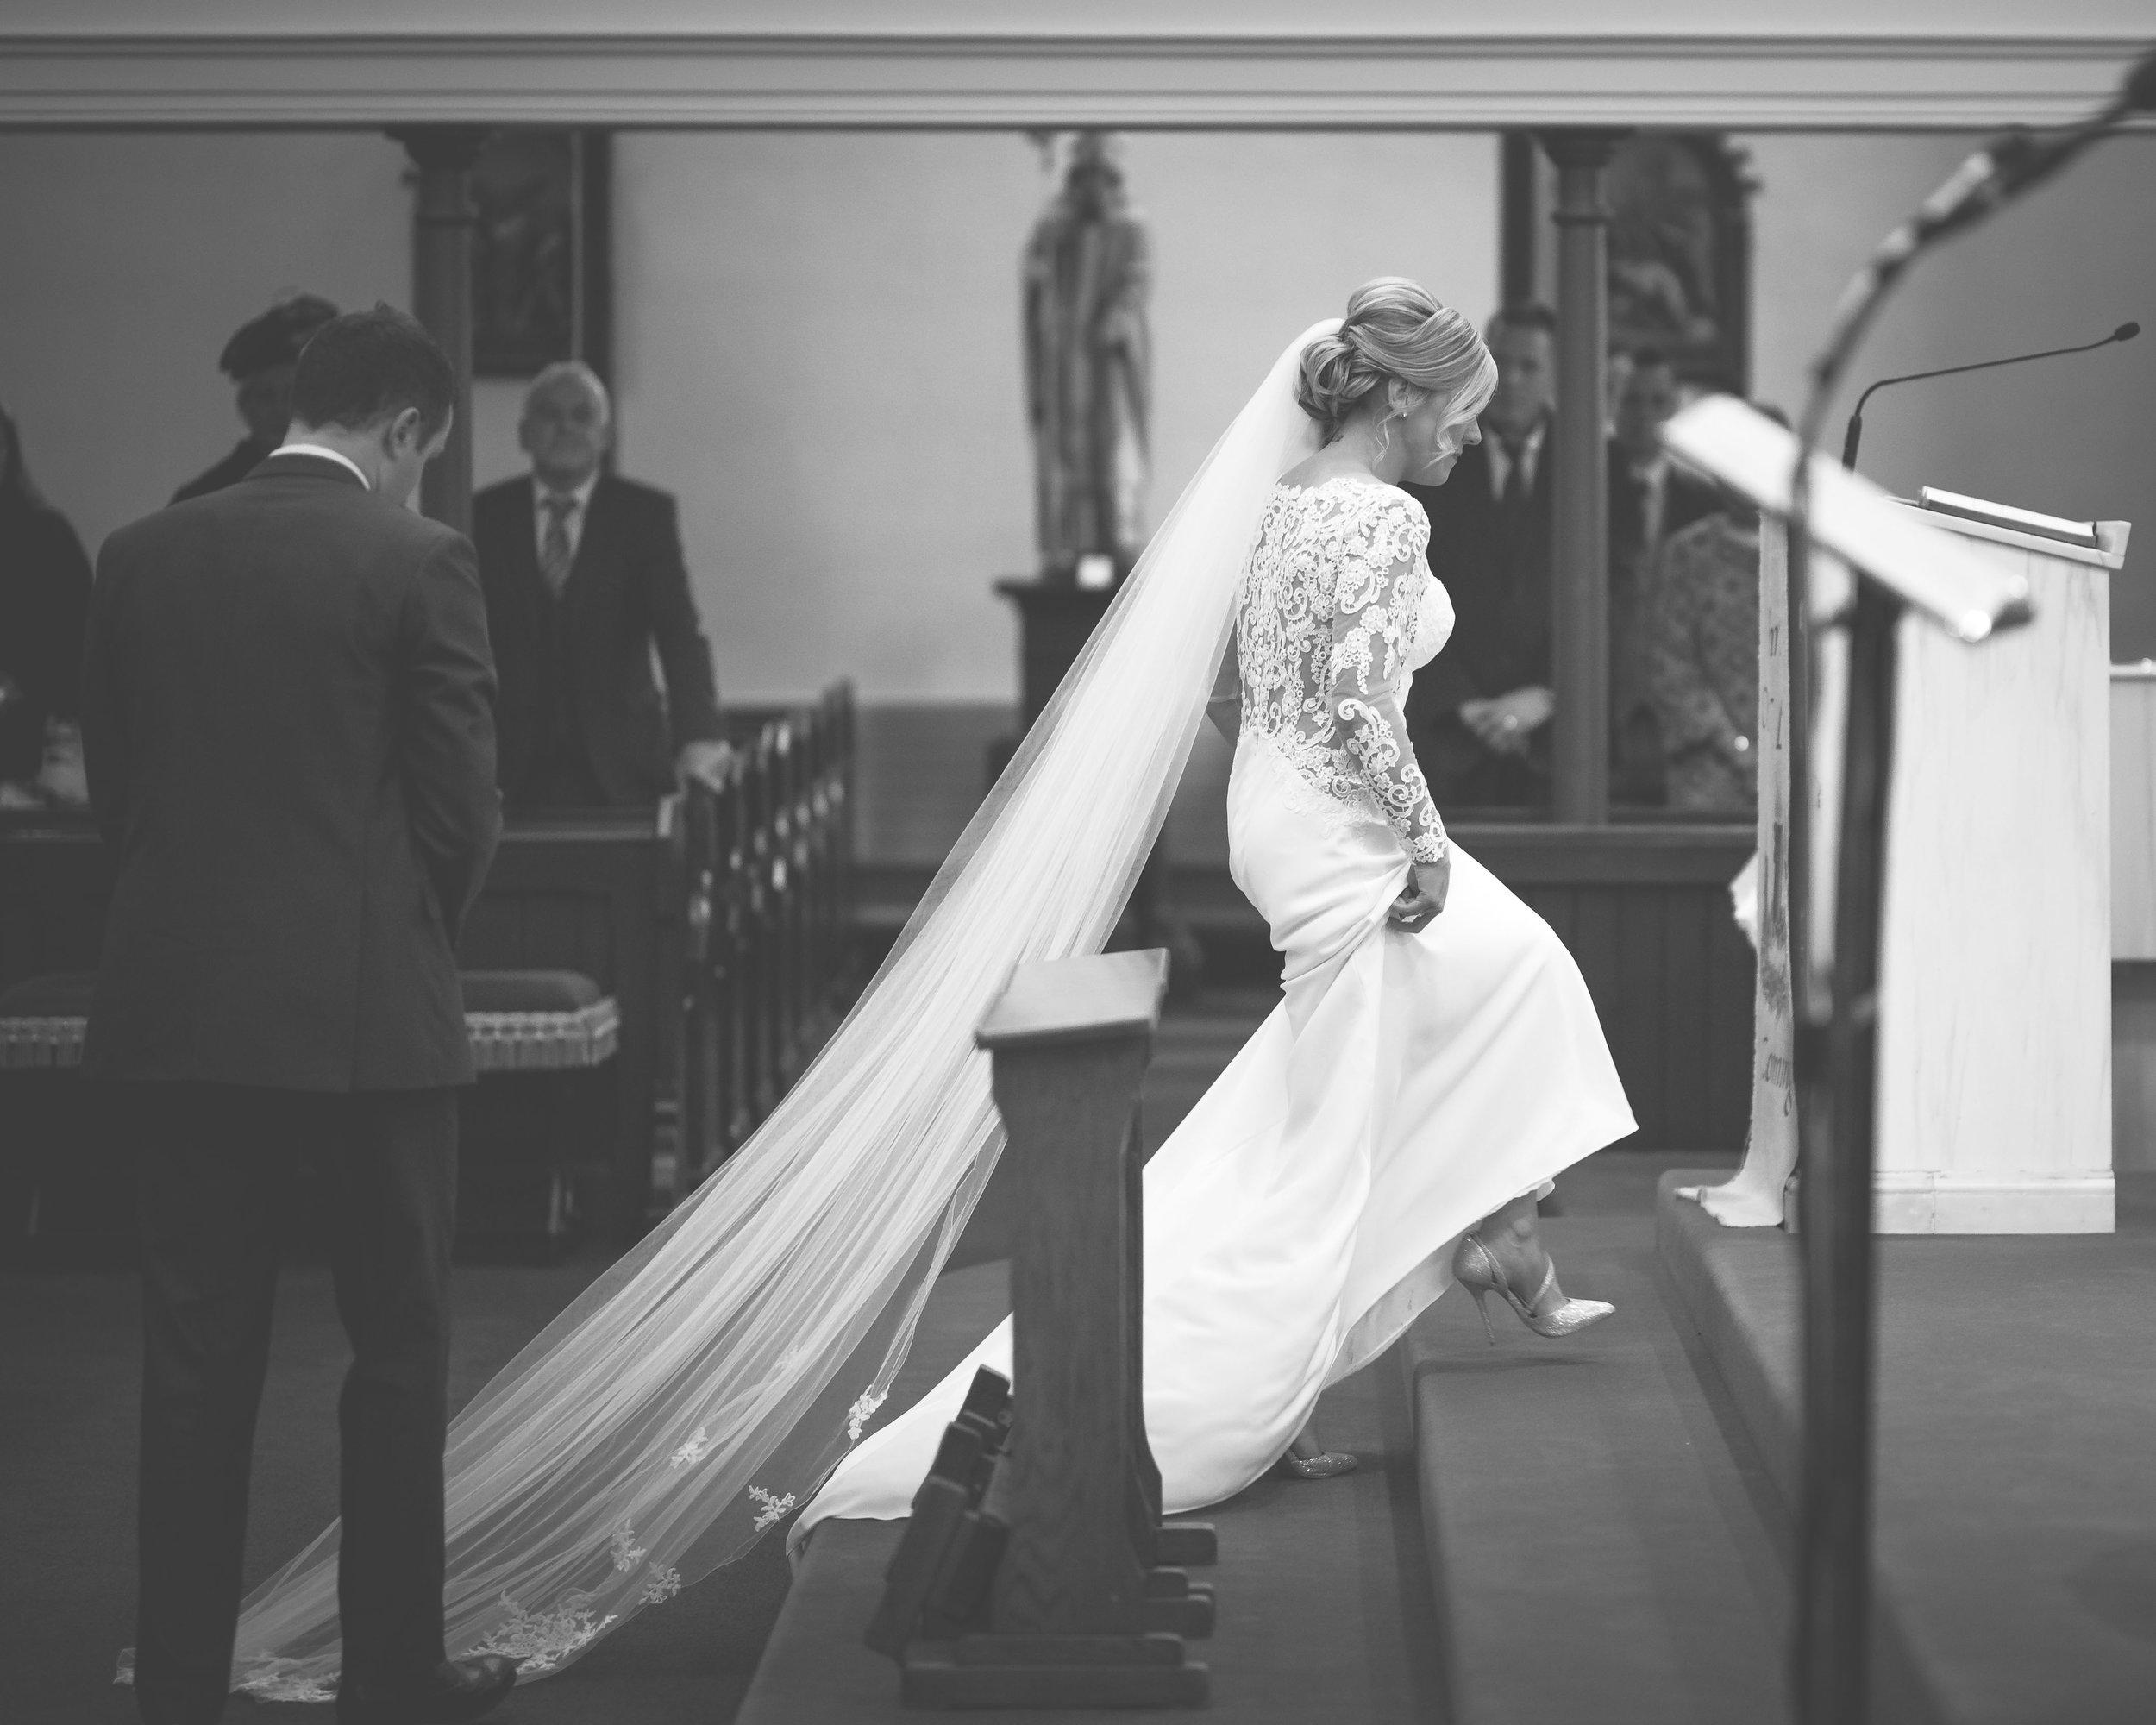 Northern Ireland Wedding Photographer | Brian McEwan Photography | Affordable Wedding Photography Throughout Antrim Down Armagh Tyrone Londonderry Derry Down Fermanagh -74.jpg